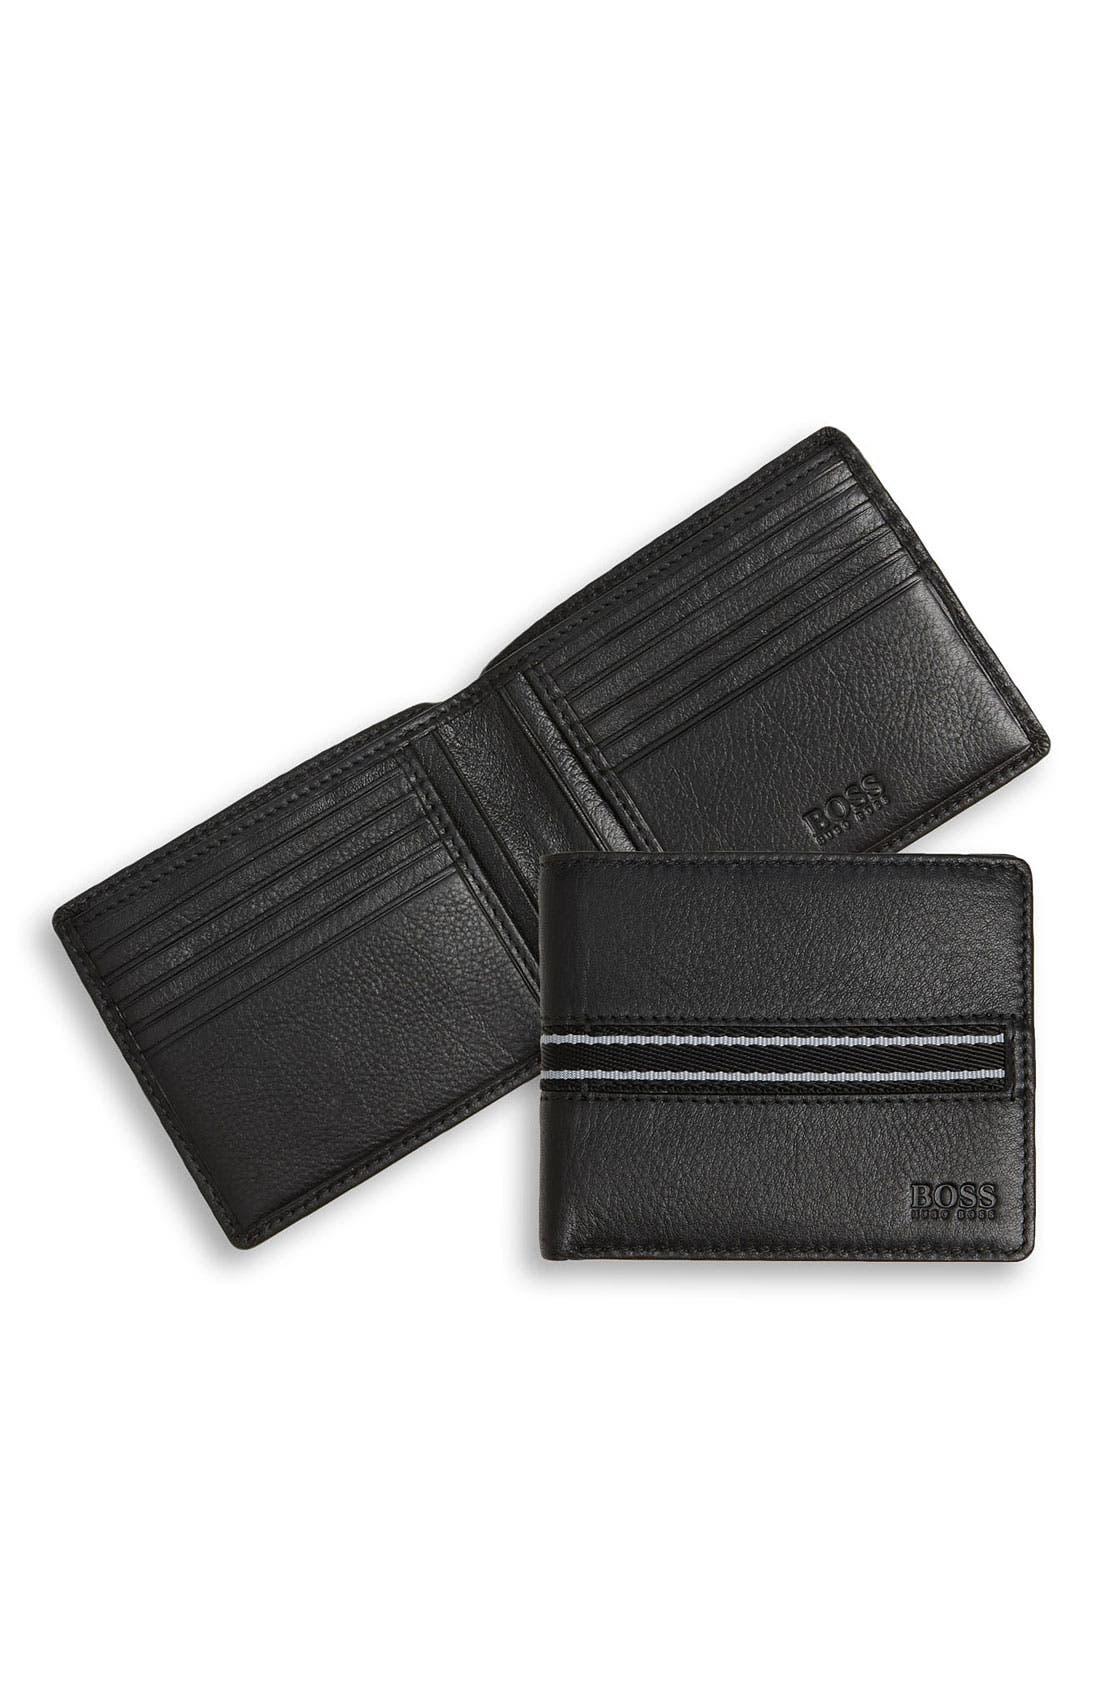 Main Image - BOSS HUGO BOSS 'Starskie' Wallet